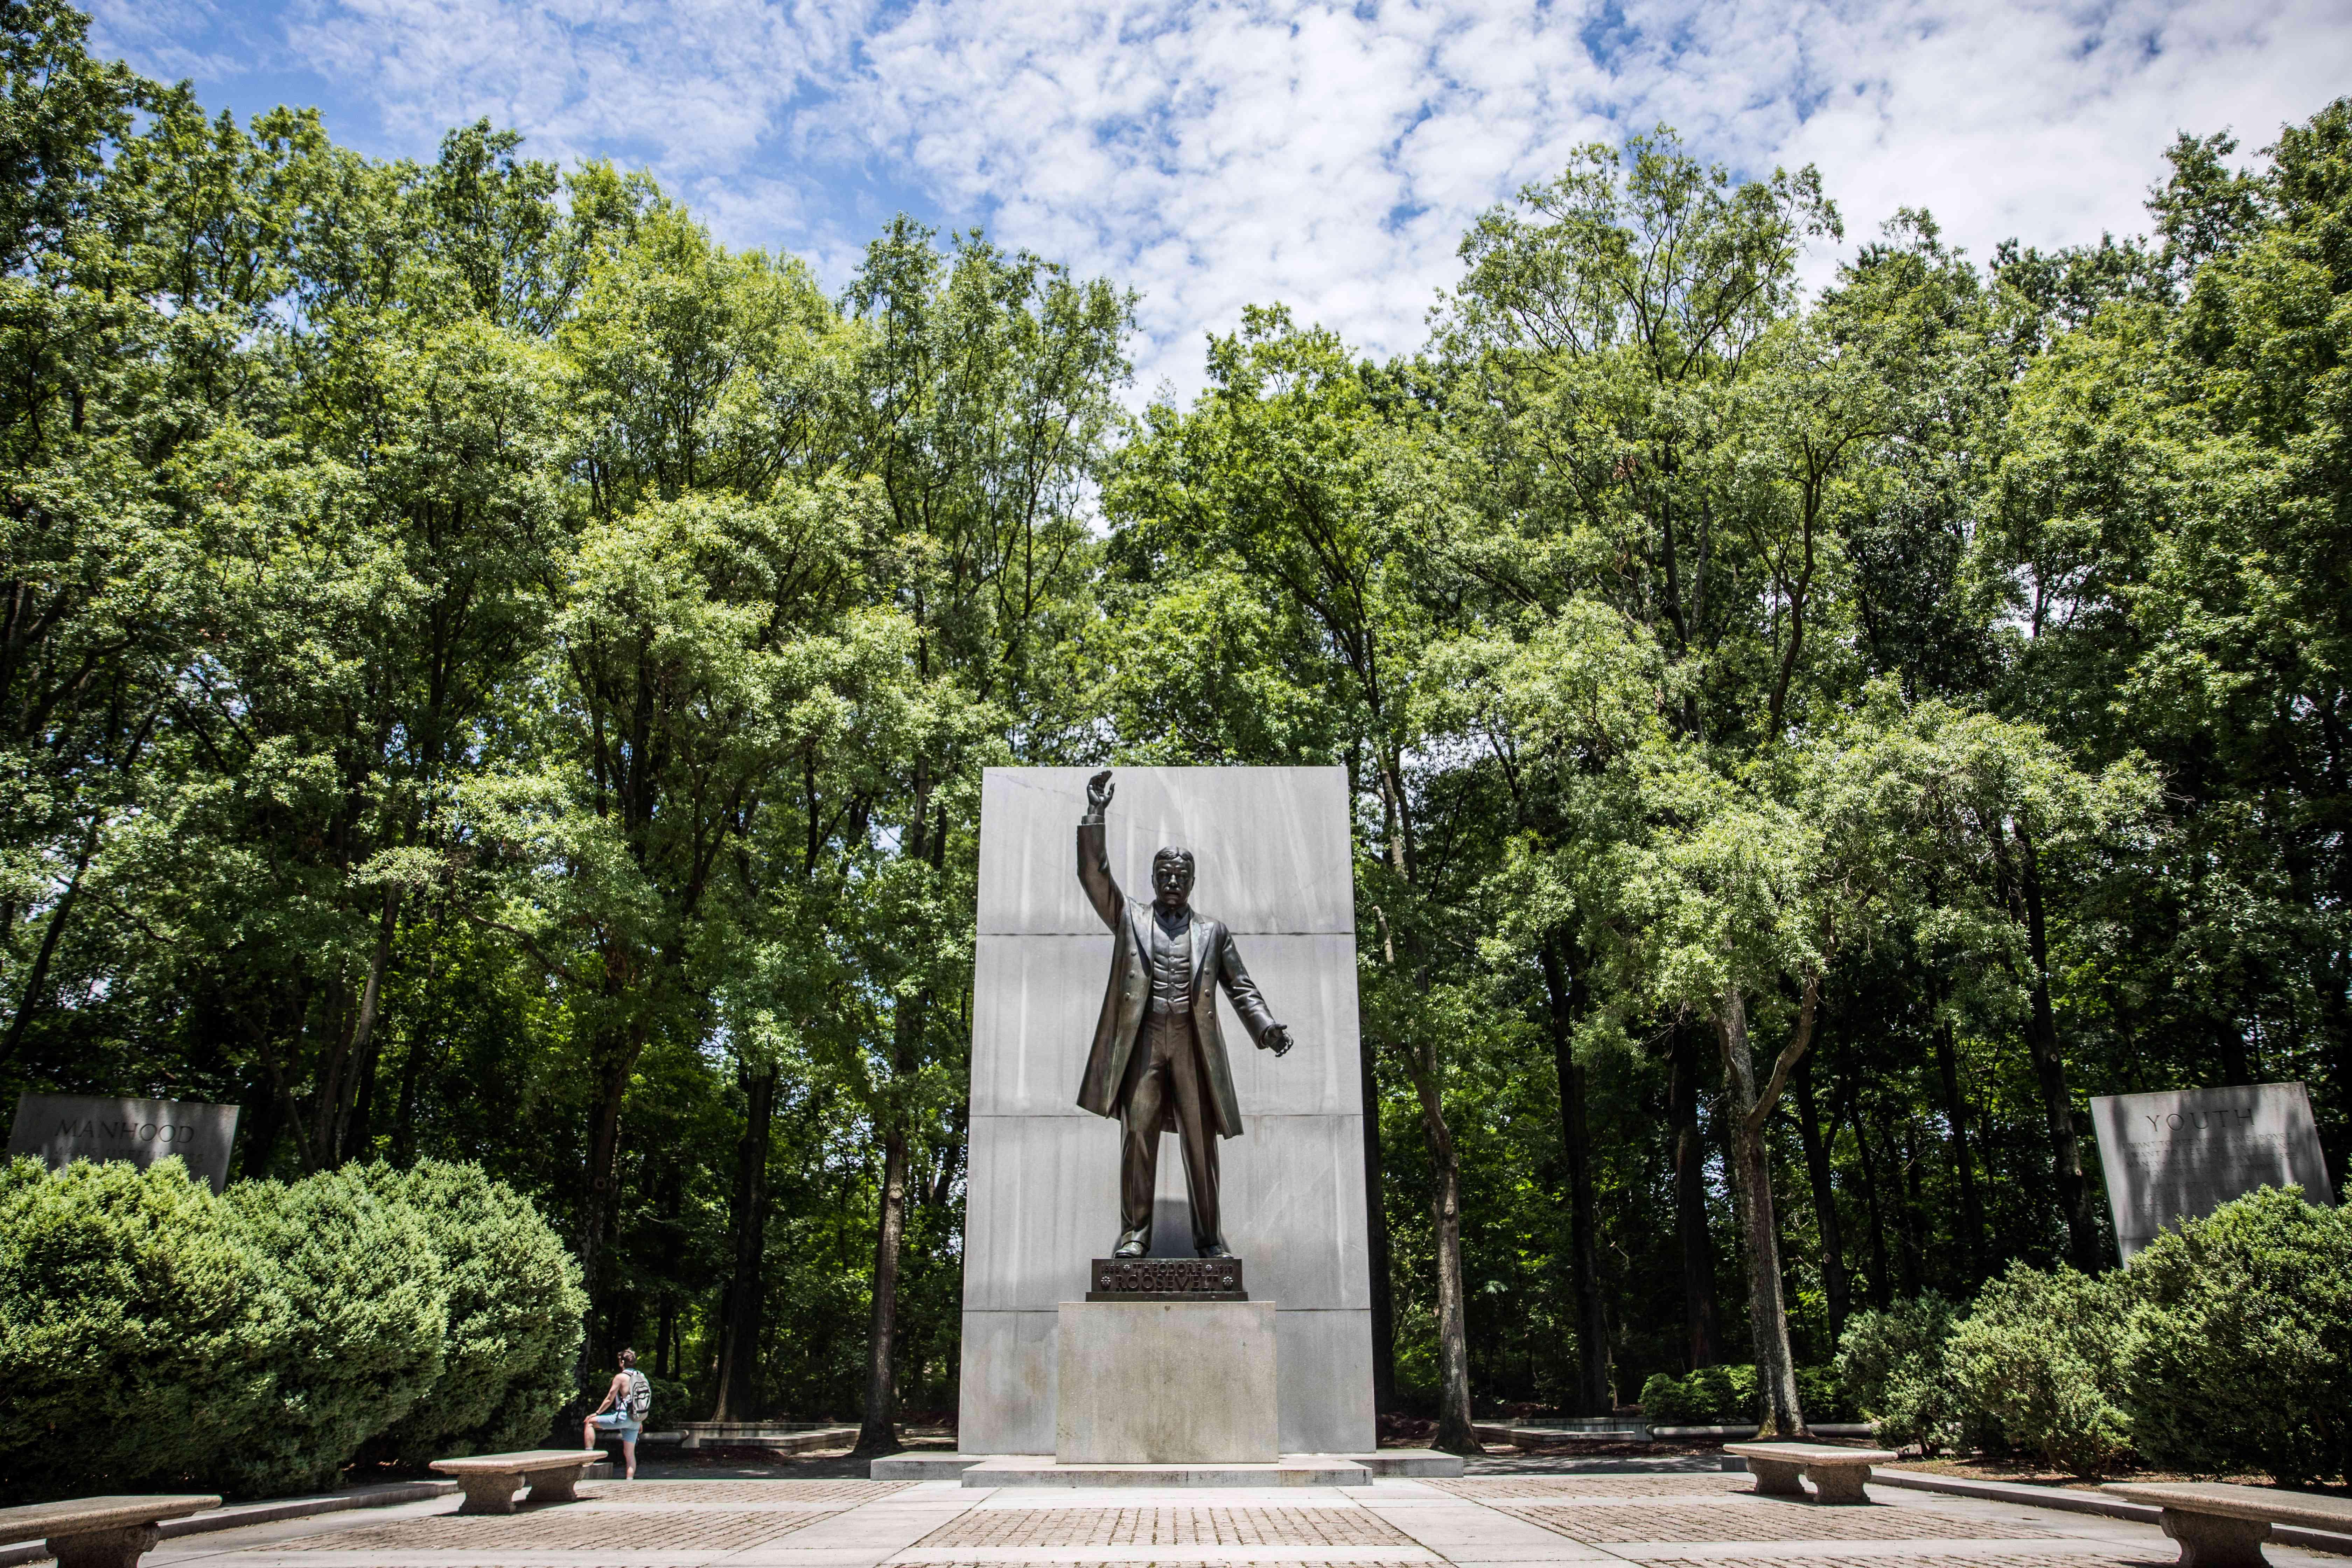 Estatua en el Parque Theodore Roosevelt